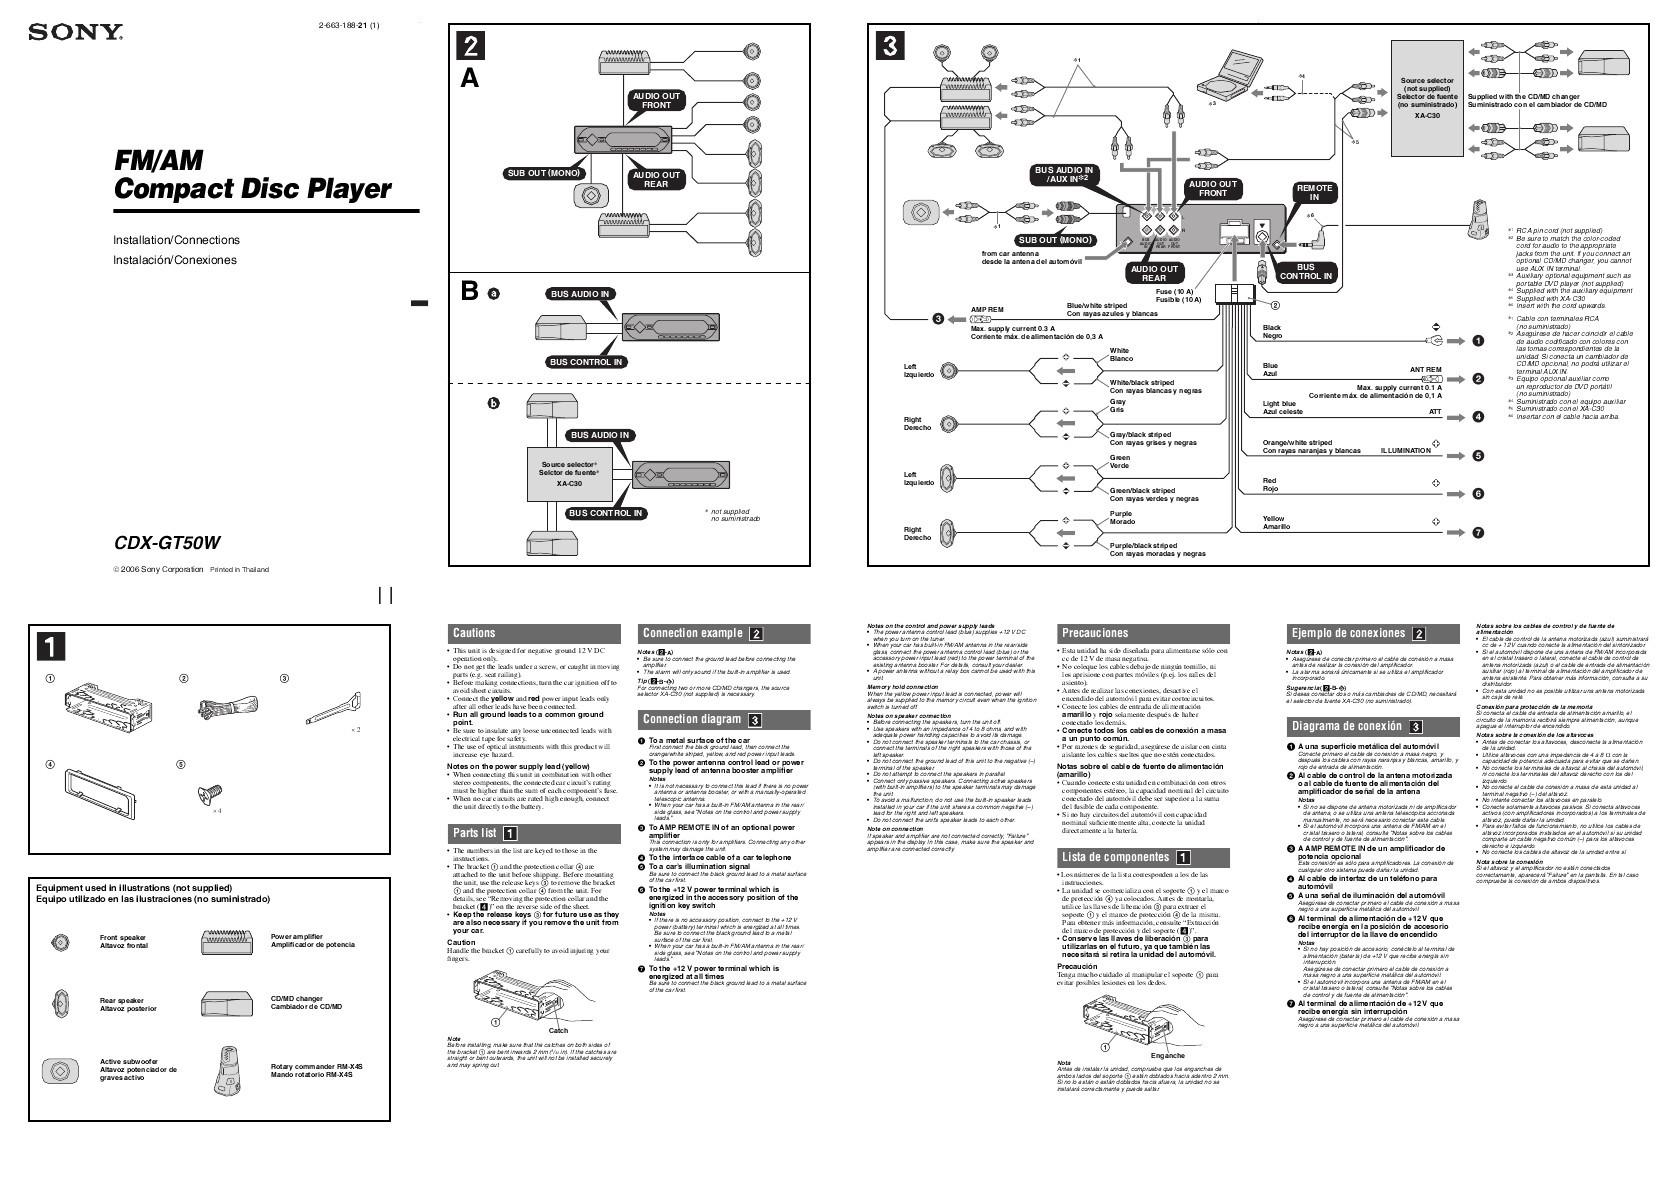 sony cdx m730 wiring diagram wiring diagram sony explod wiring diagram cdx gt530 wiring diagram datasony wiring diagrams wiring diagram sony explod wiring